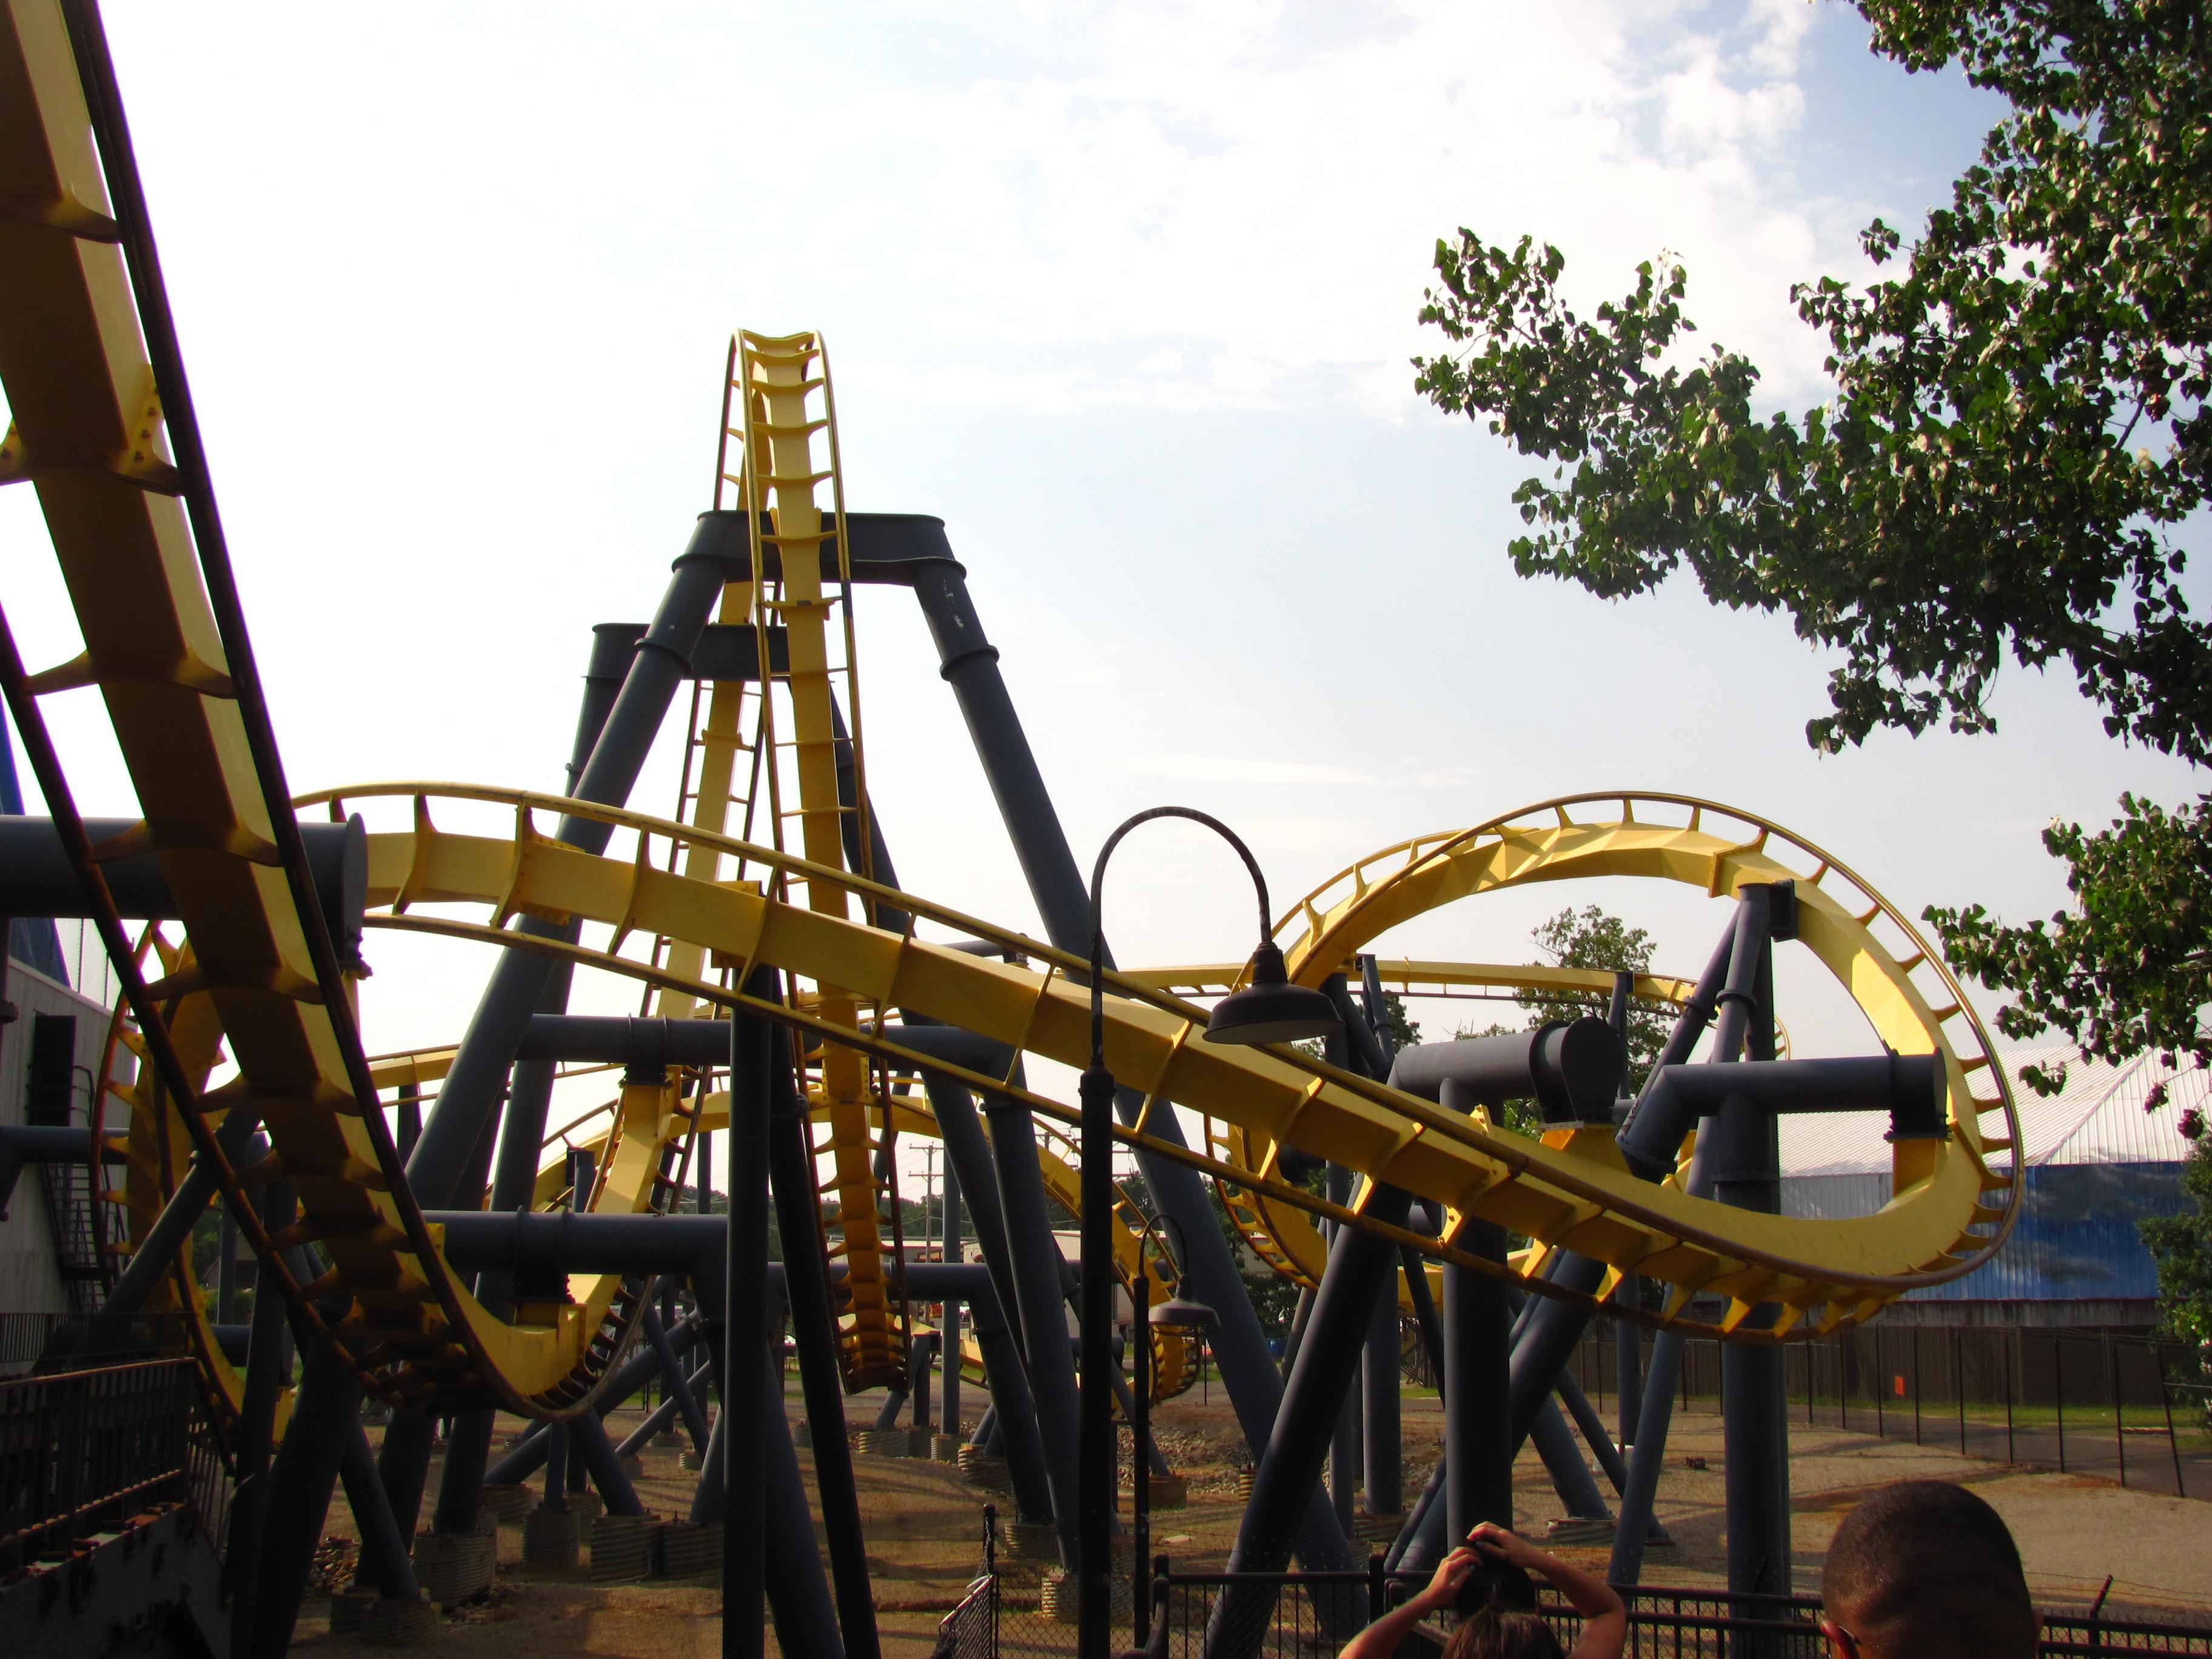 Batman_The_Ride_at_Six_Flags_Great_Adventure_05.jpg